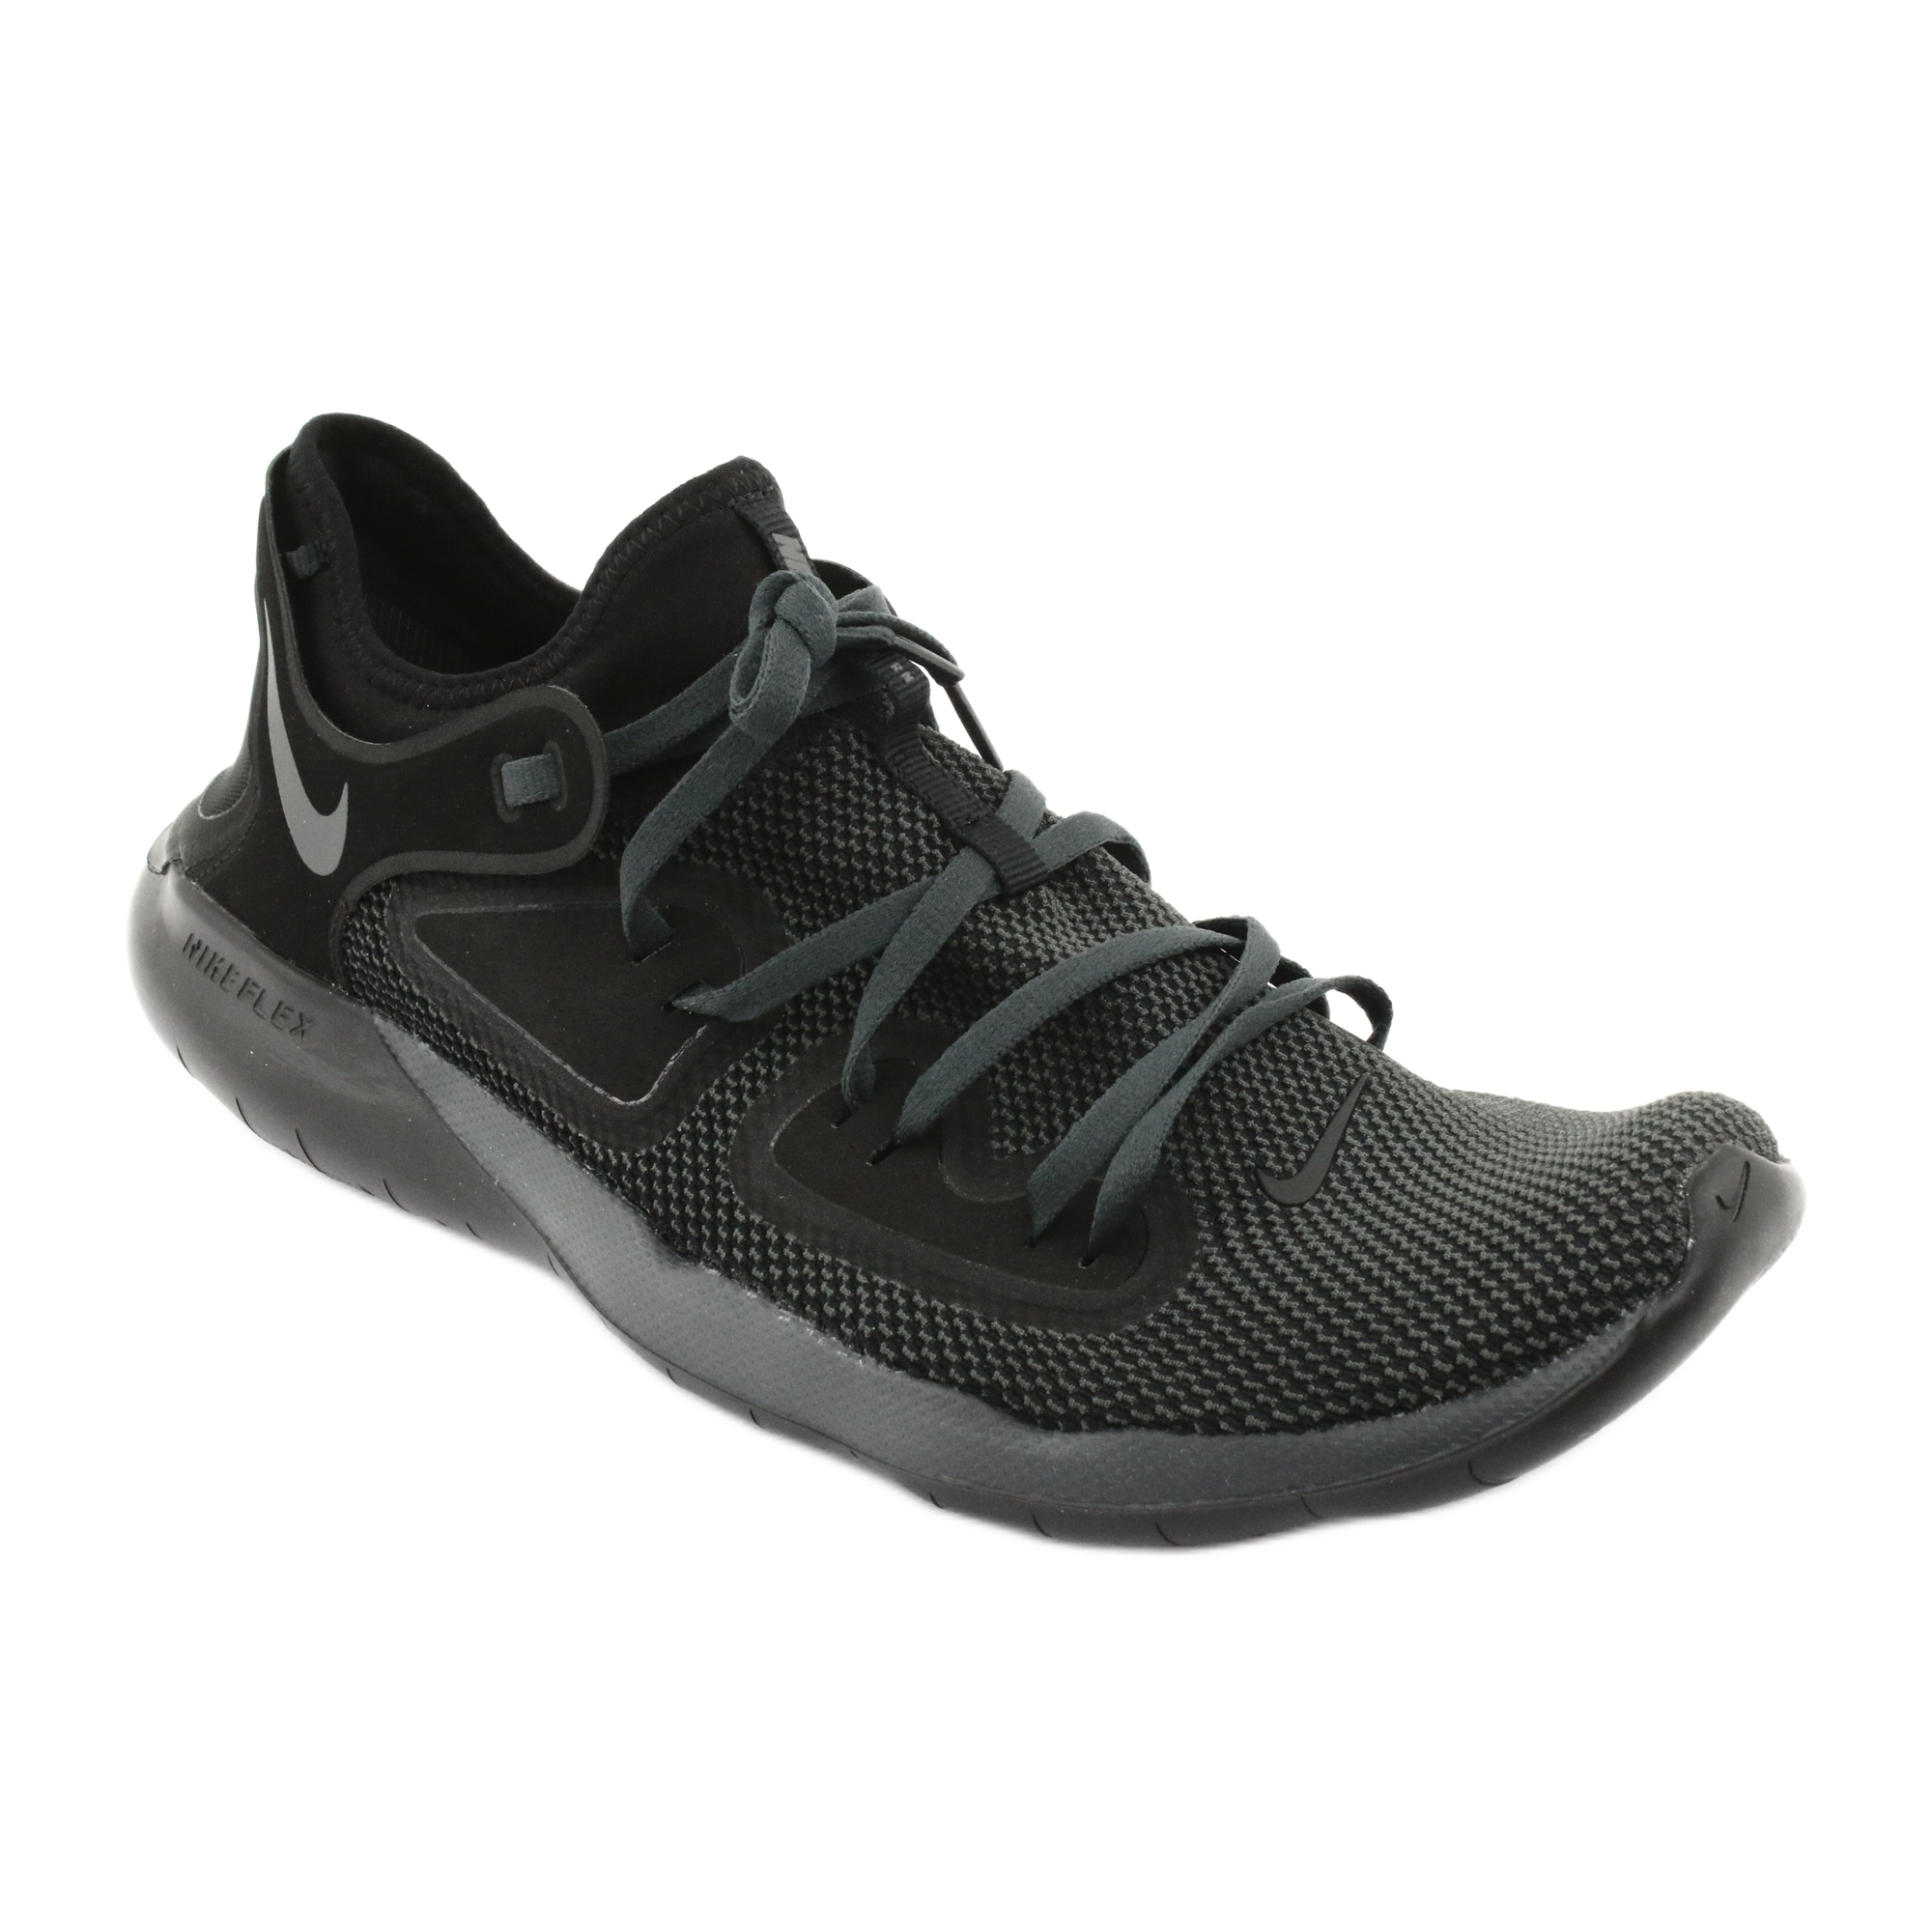 Zapatillas de running Nike Flex 2019 Rn M AQ7483 005 negro